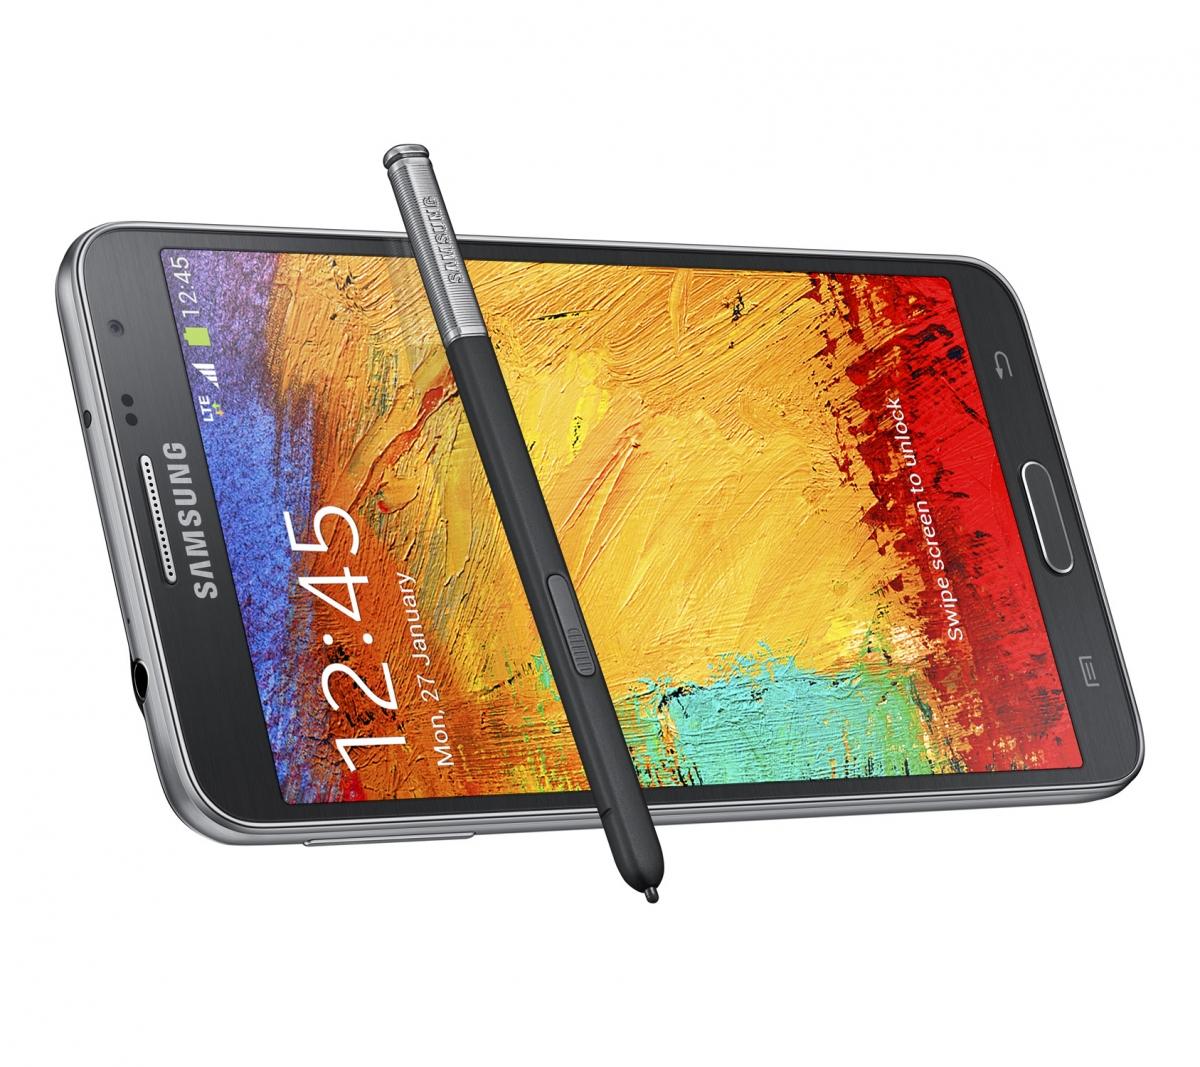 Samsung Unveils Galaxy Note 3 Neo, Debuts First Hexa-Core Exynos Processor